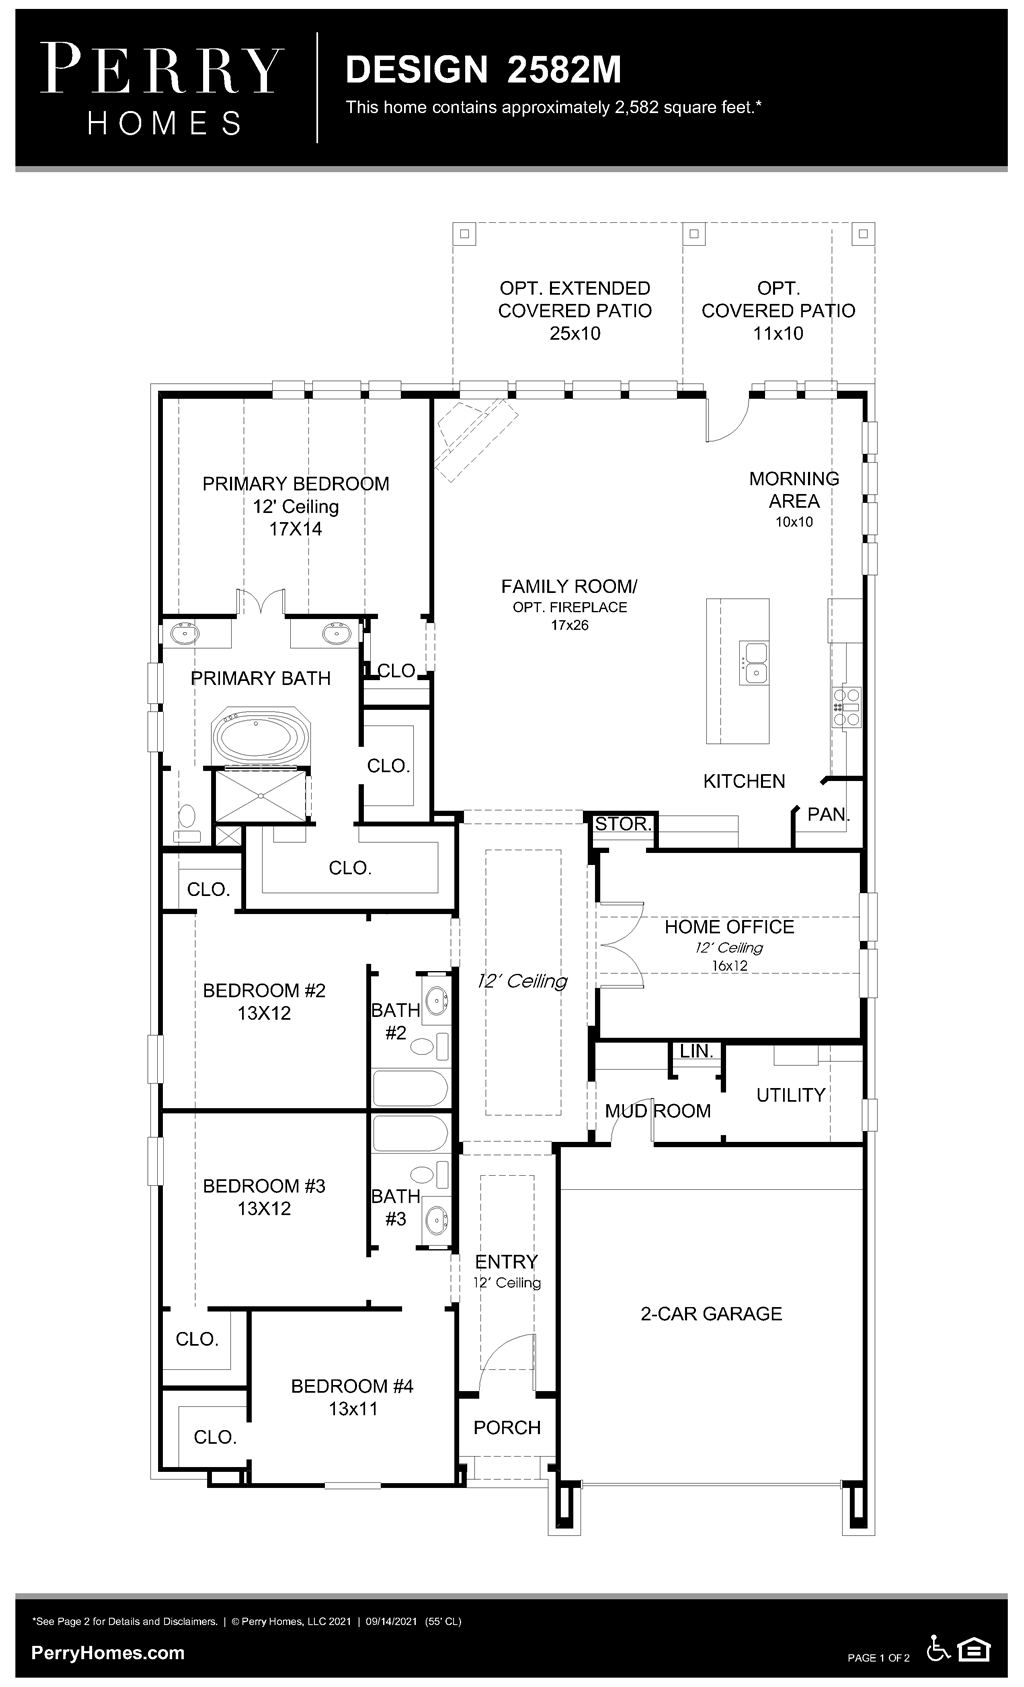 Floor Plan for 2582M